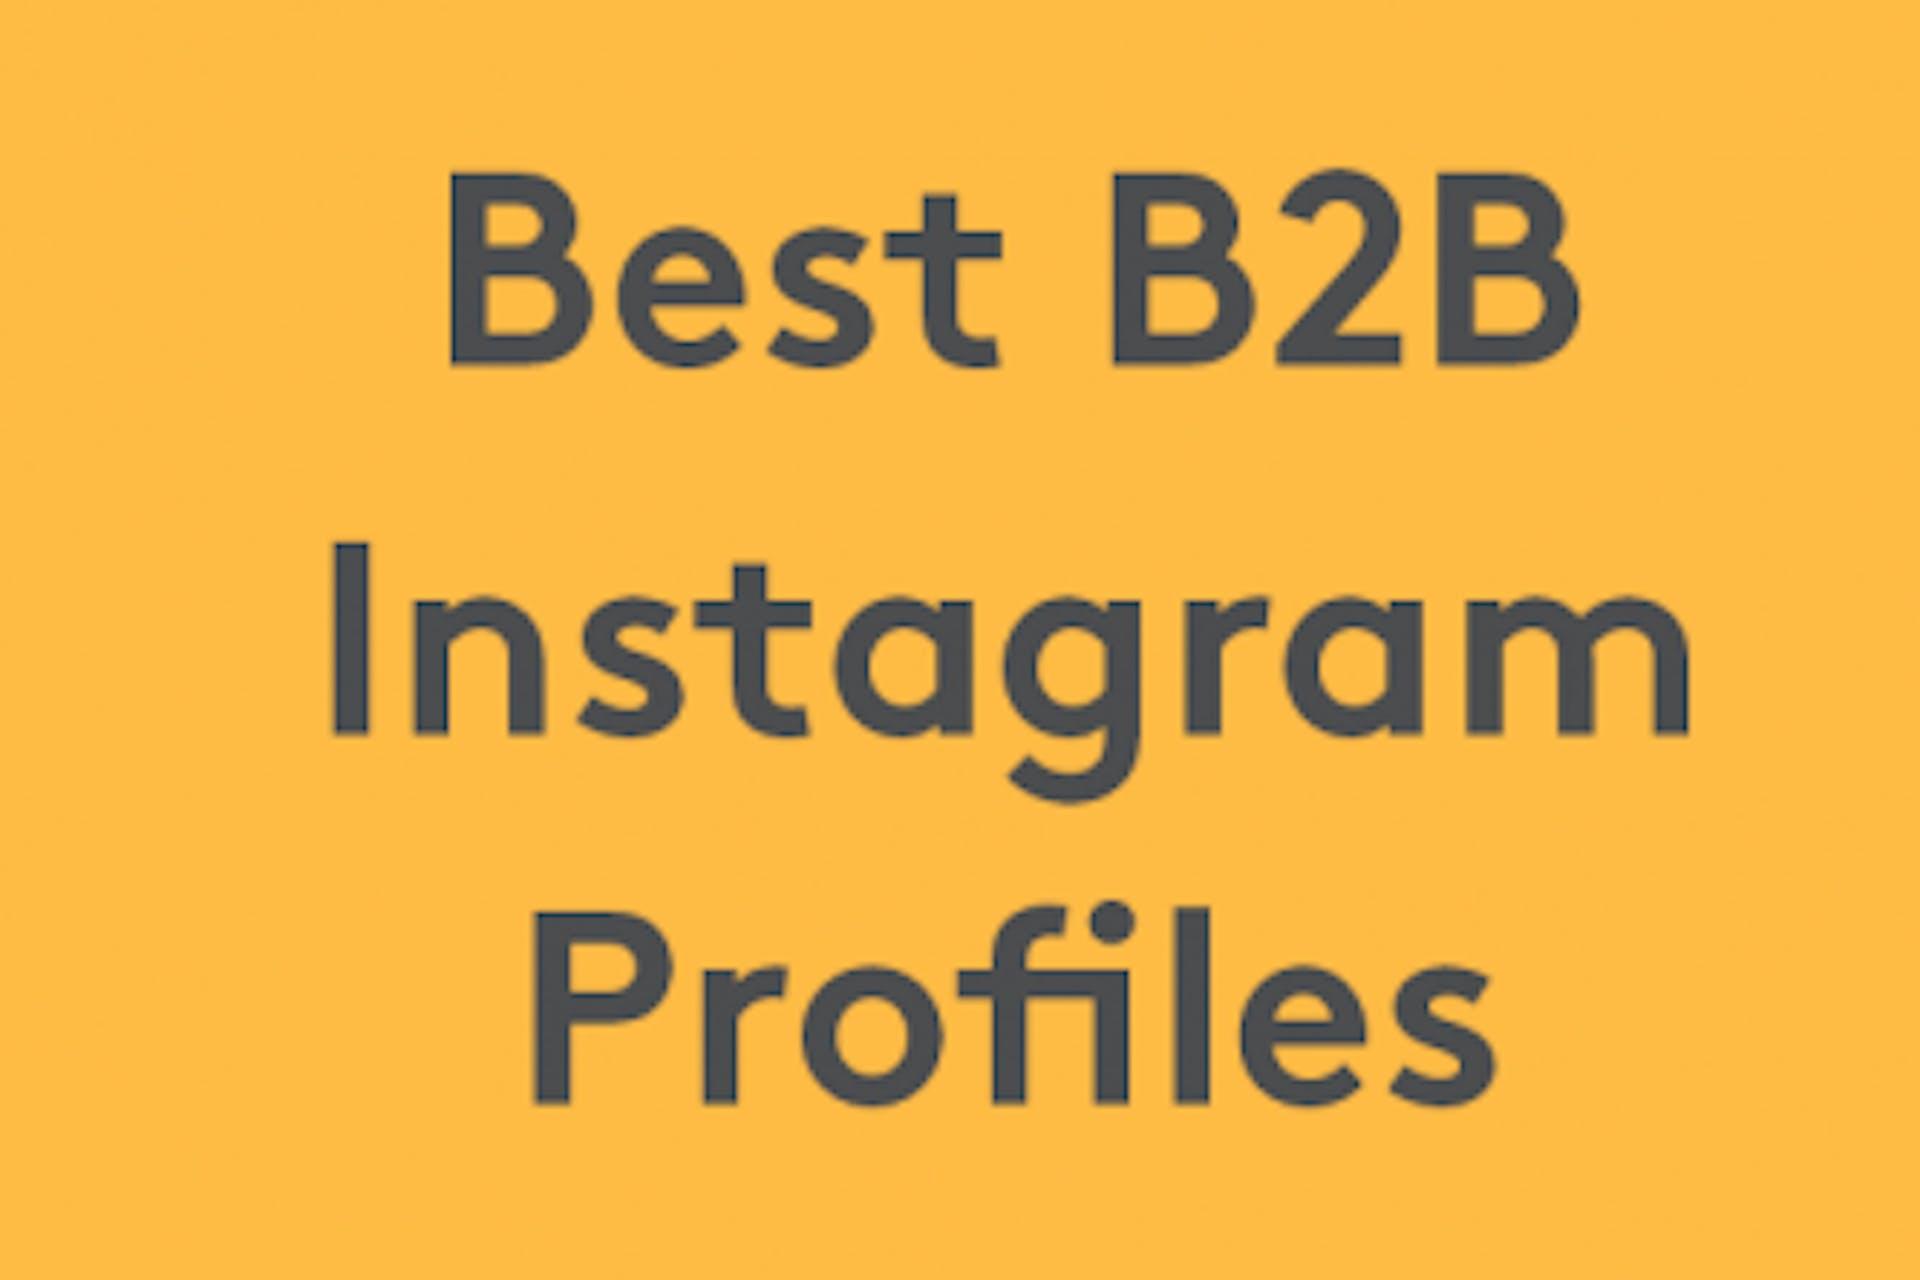 best b2b Instagram profiles